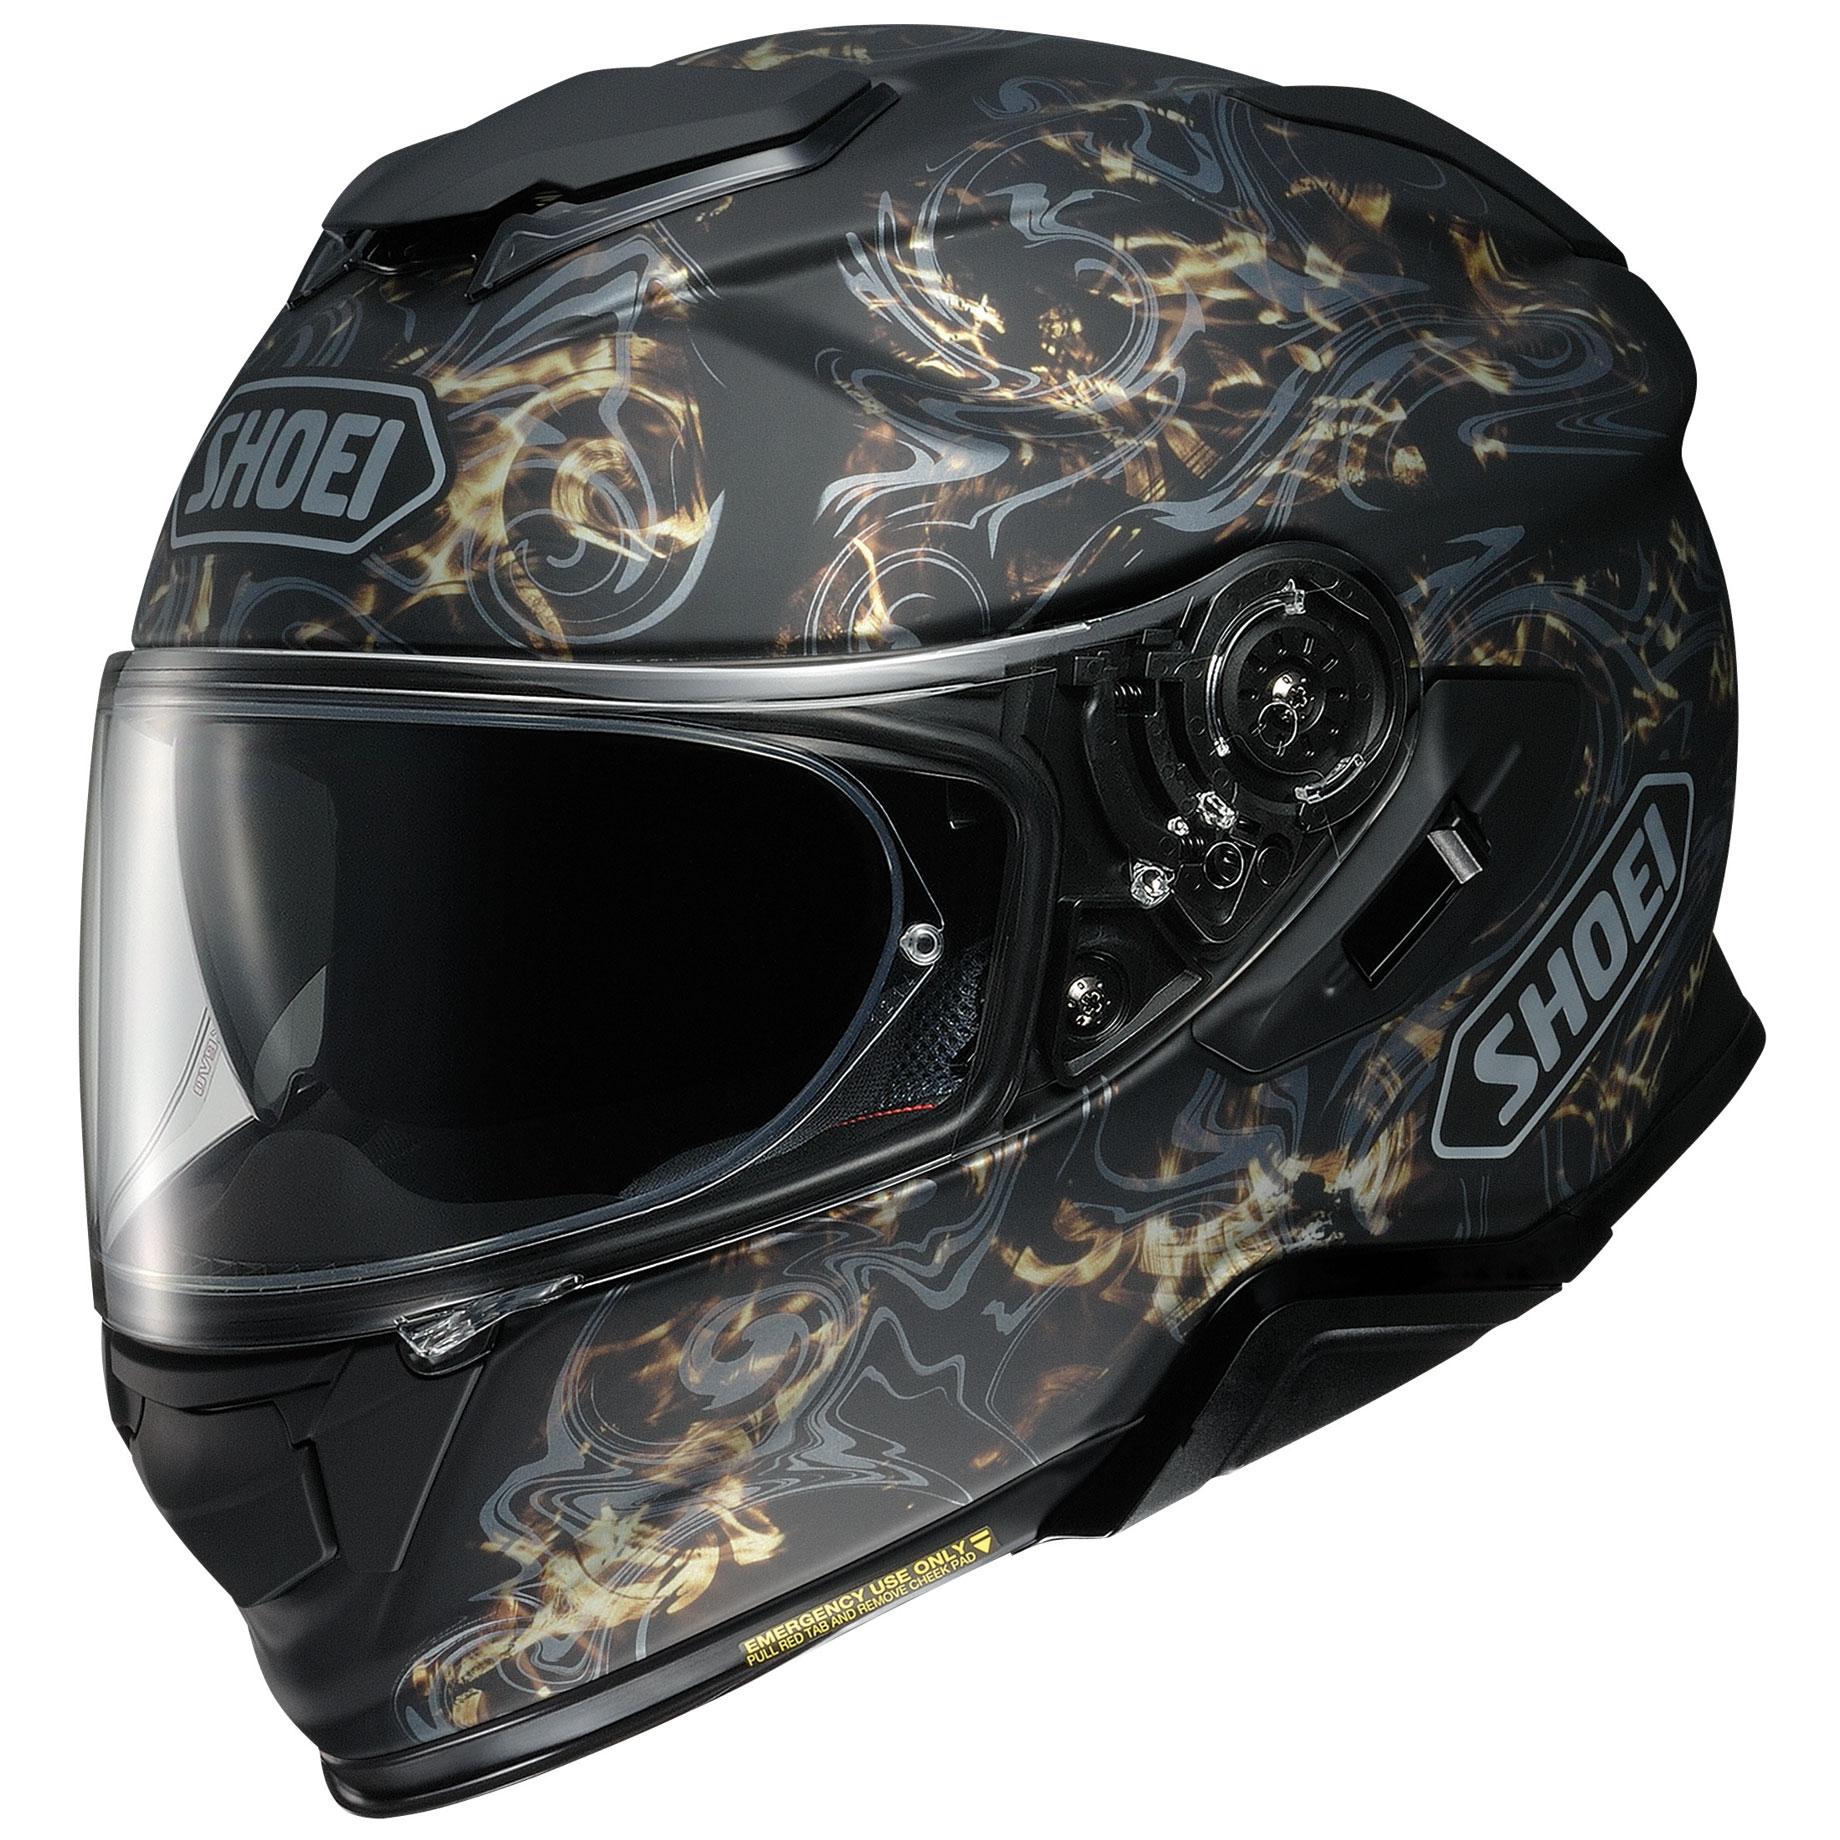 Shoei GT-Air II Conjure Matte Black/Gold Full Face Helmet